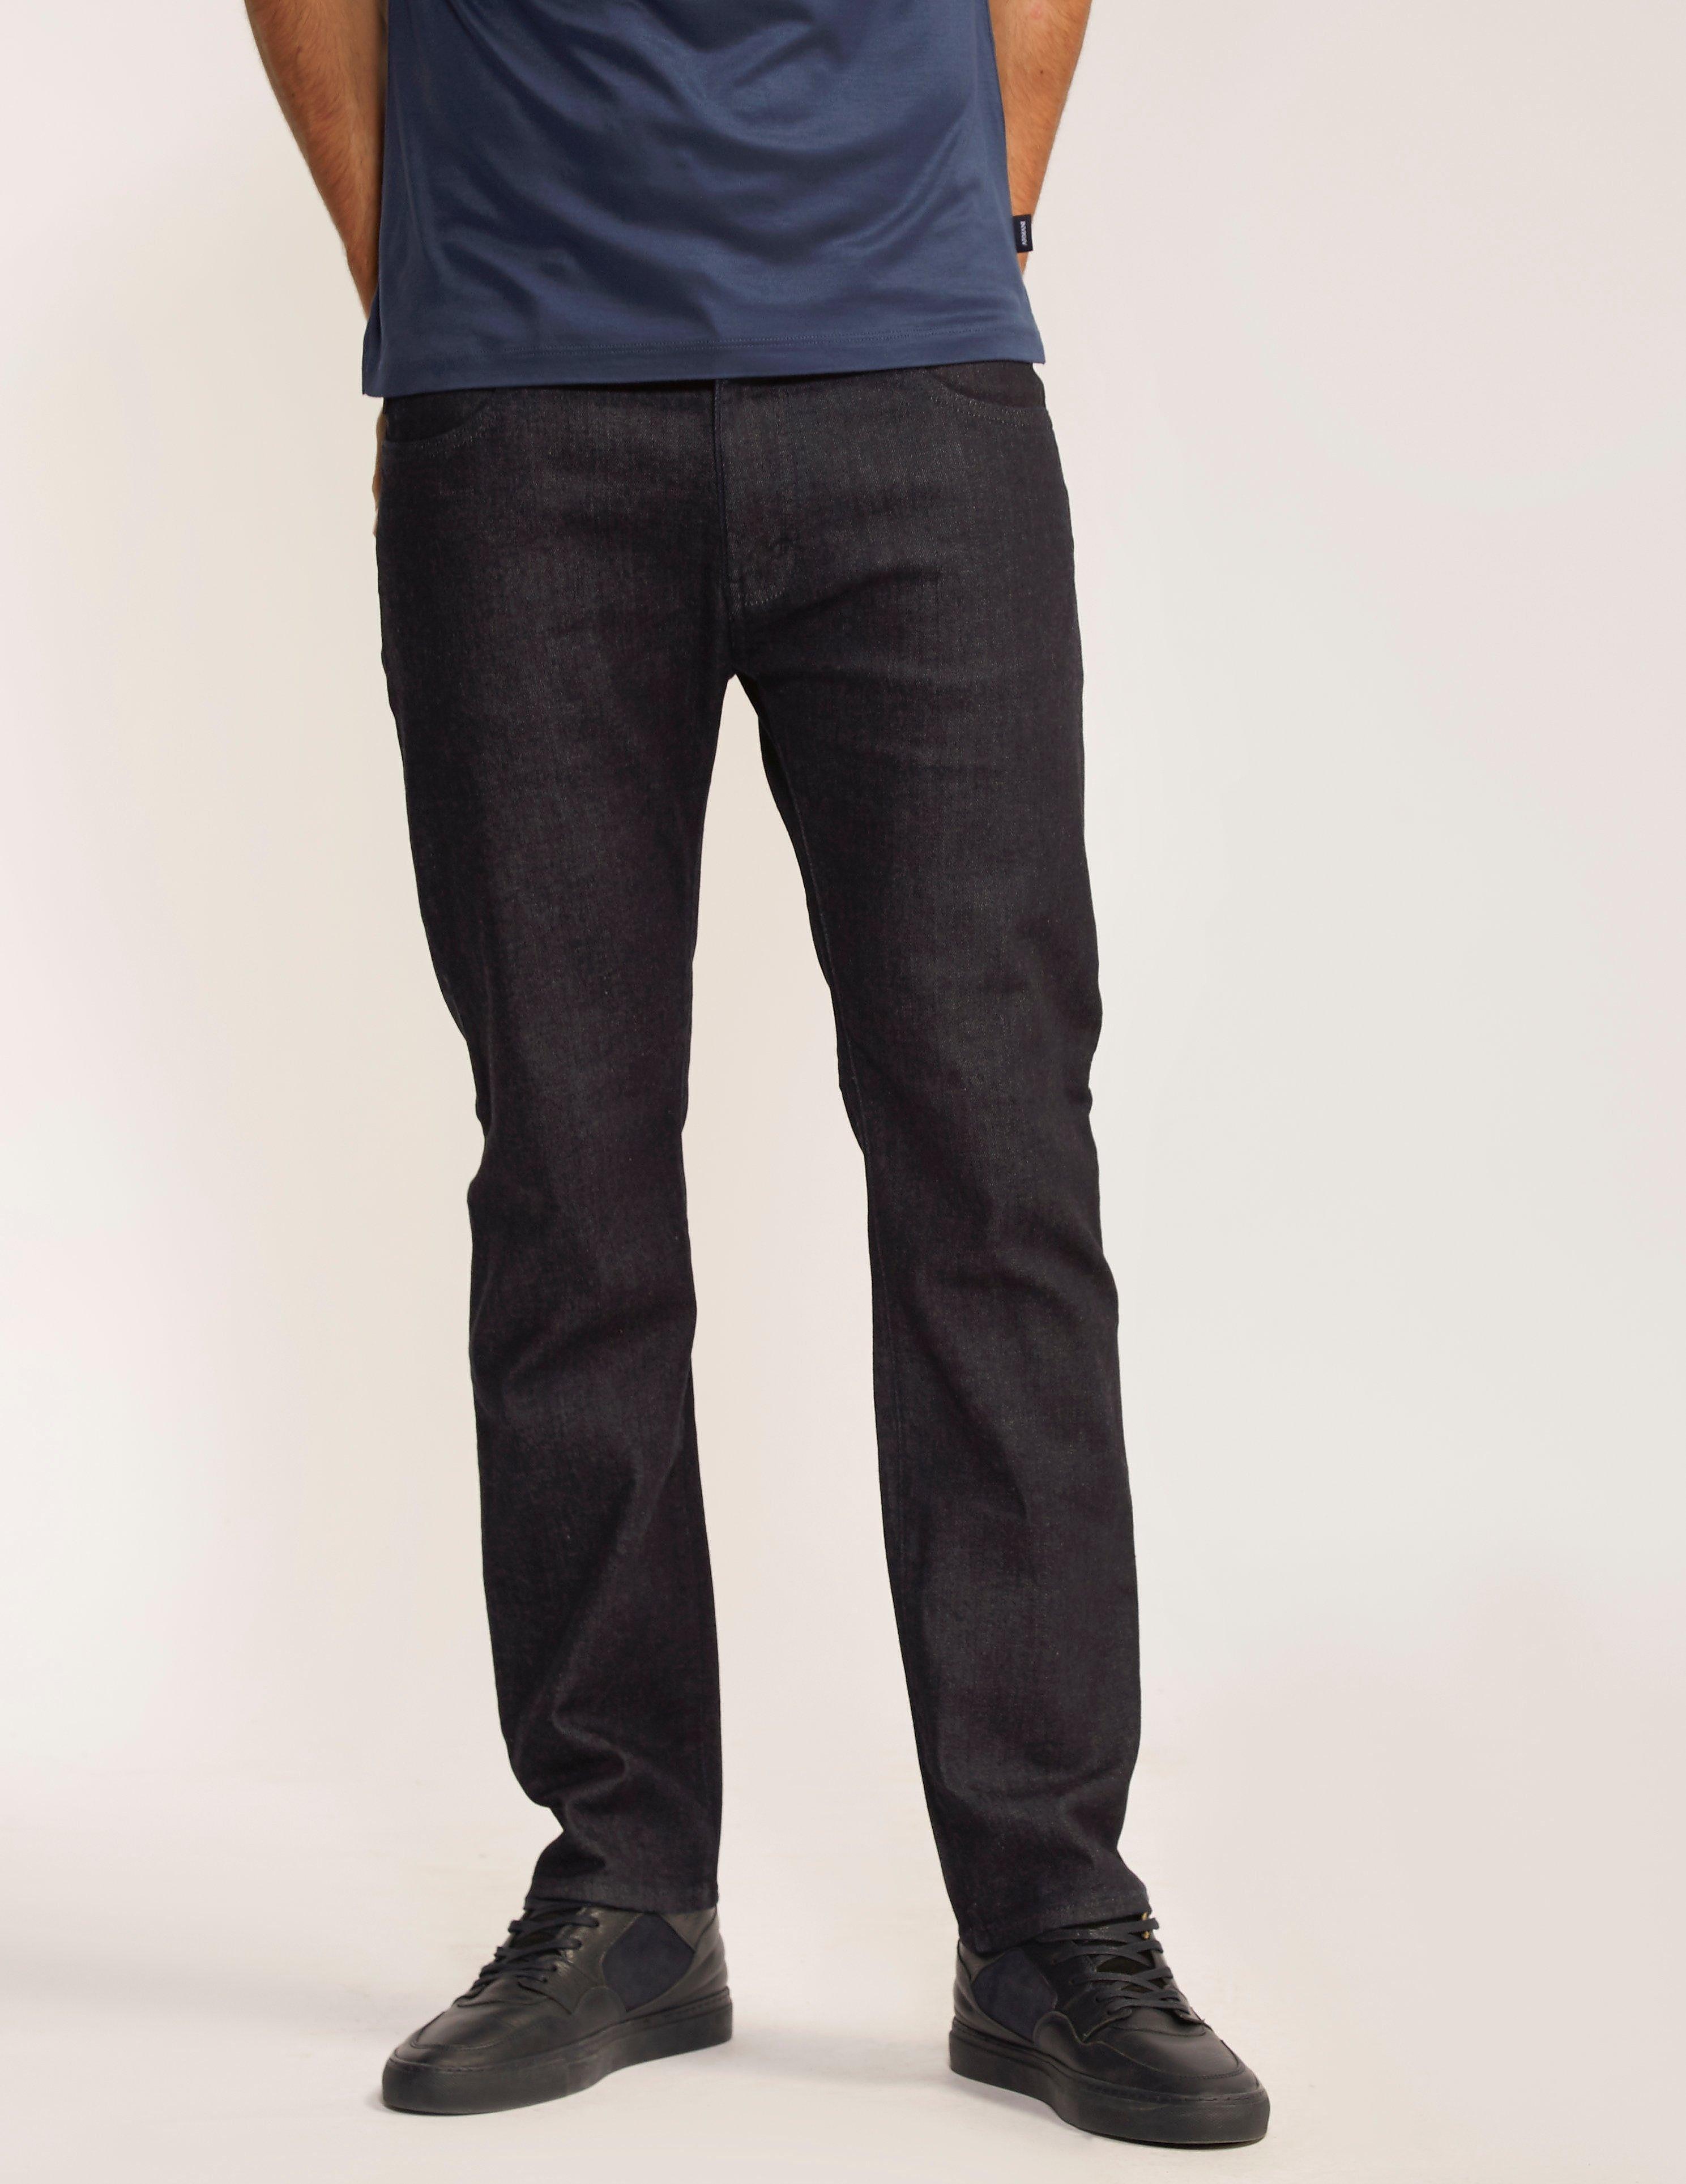 Armani Jeans J45 Jeans - Short length